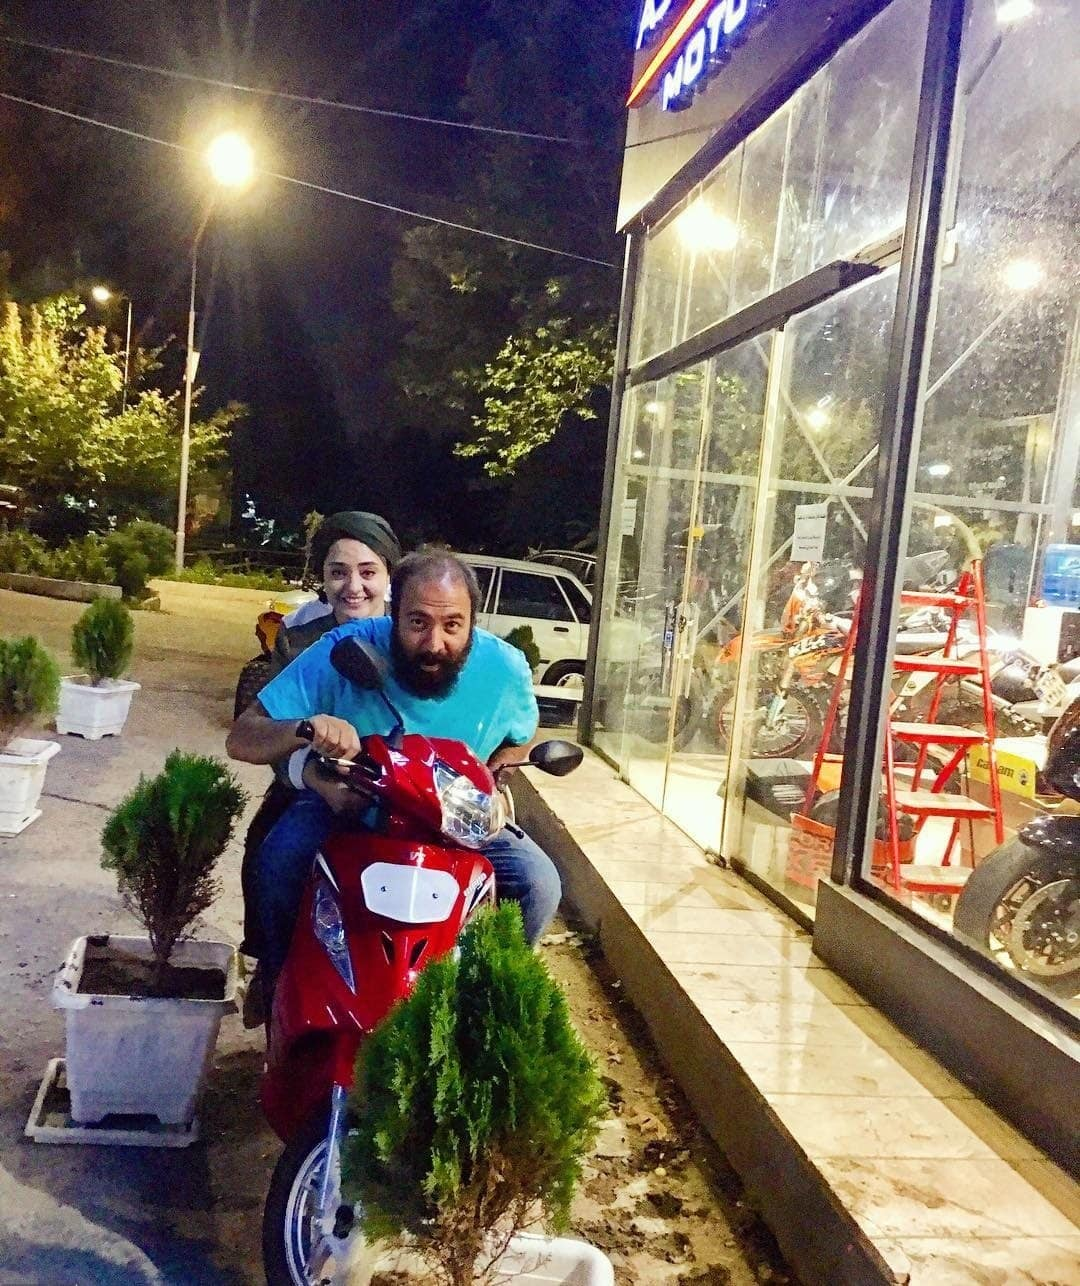 عکس خوشگذرانی نرگس محمدی و همسرش +اینستاگرام